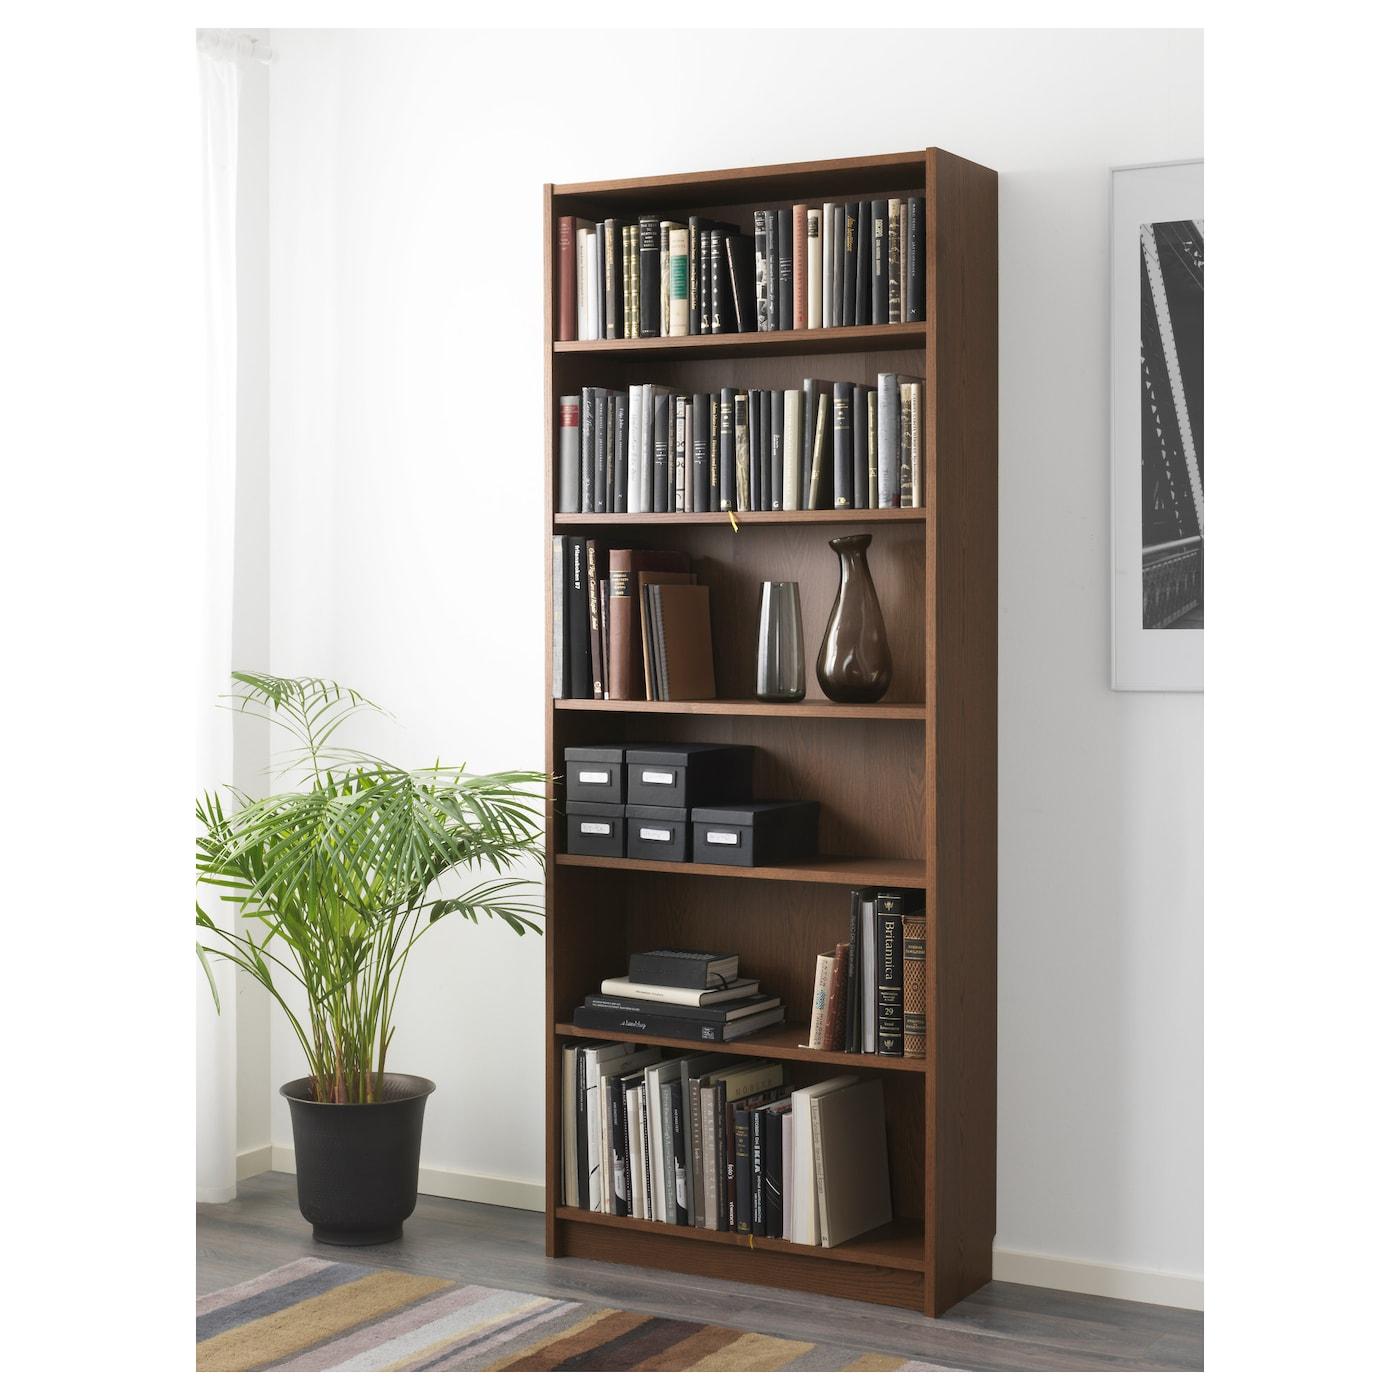 https://www.ikea.com/be/nl/images/products/billy-boekenkast-bruin-essenfineer__0418058_pe575087_s5.jpg